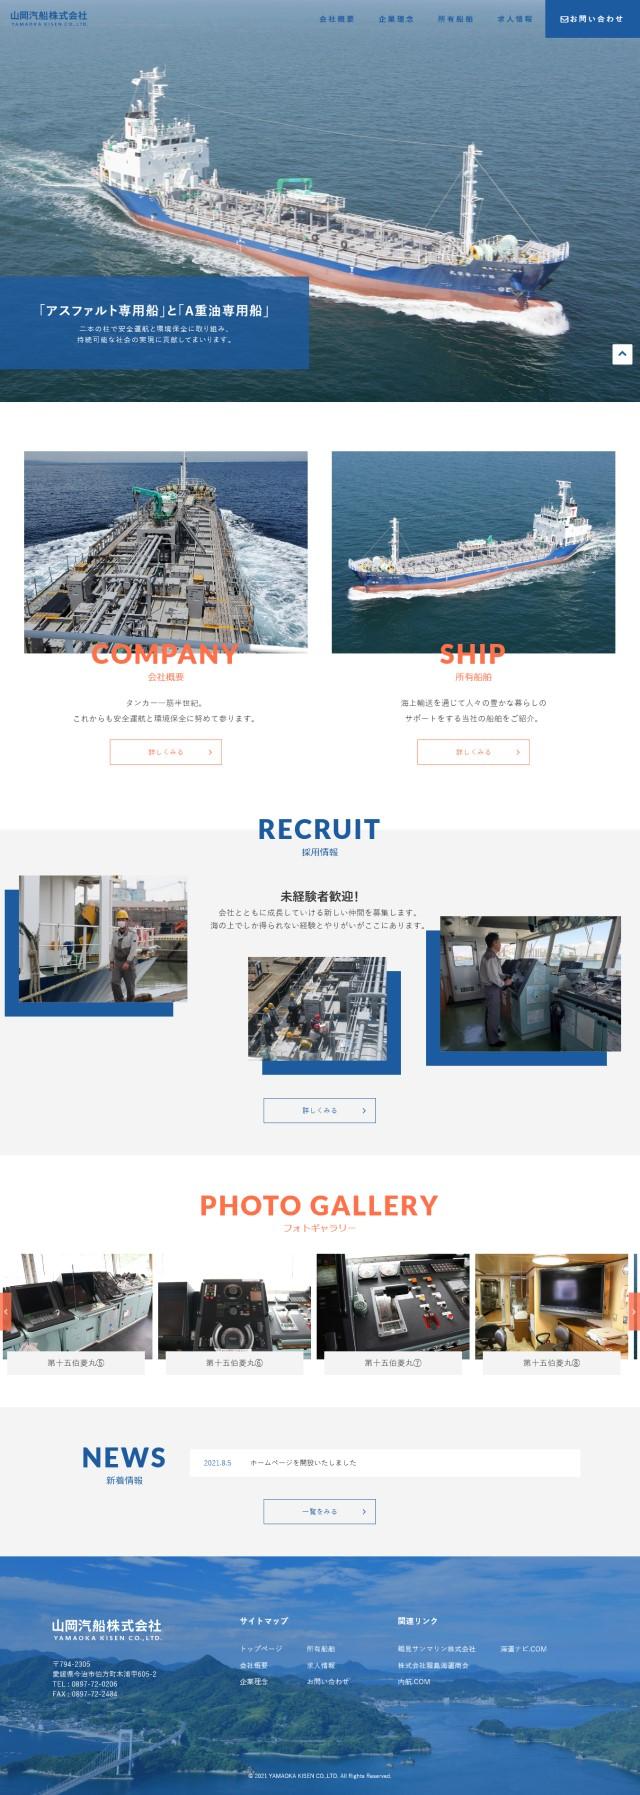 Screenshot 2021-08-17 at 10-50-22 山岡汽船株式会社 – 「アスファルト専用船」と「A重油専用船」二本の柱で安全運航と環境保全に取り組み、持続可能な社会の実現に貢献してまいります。